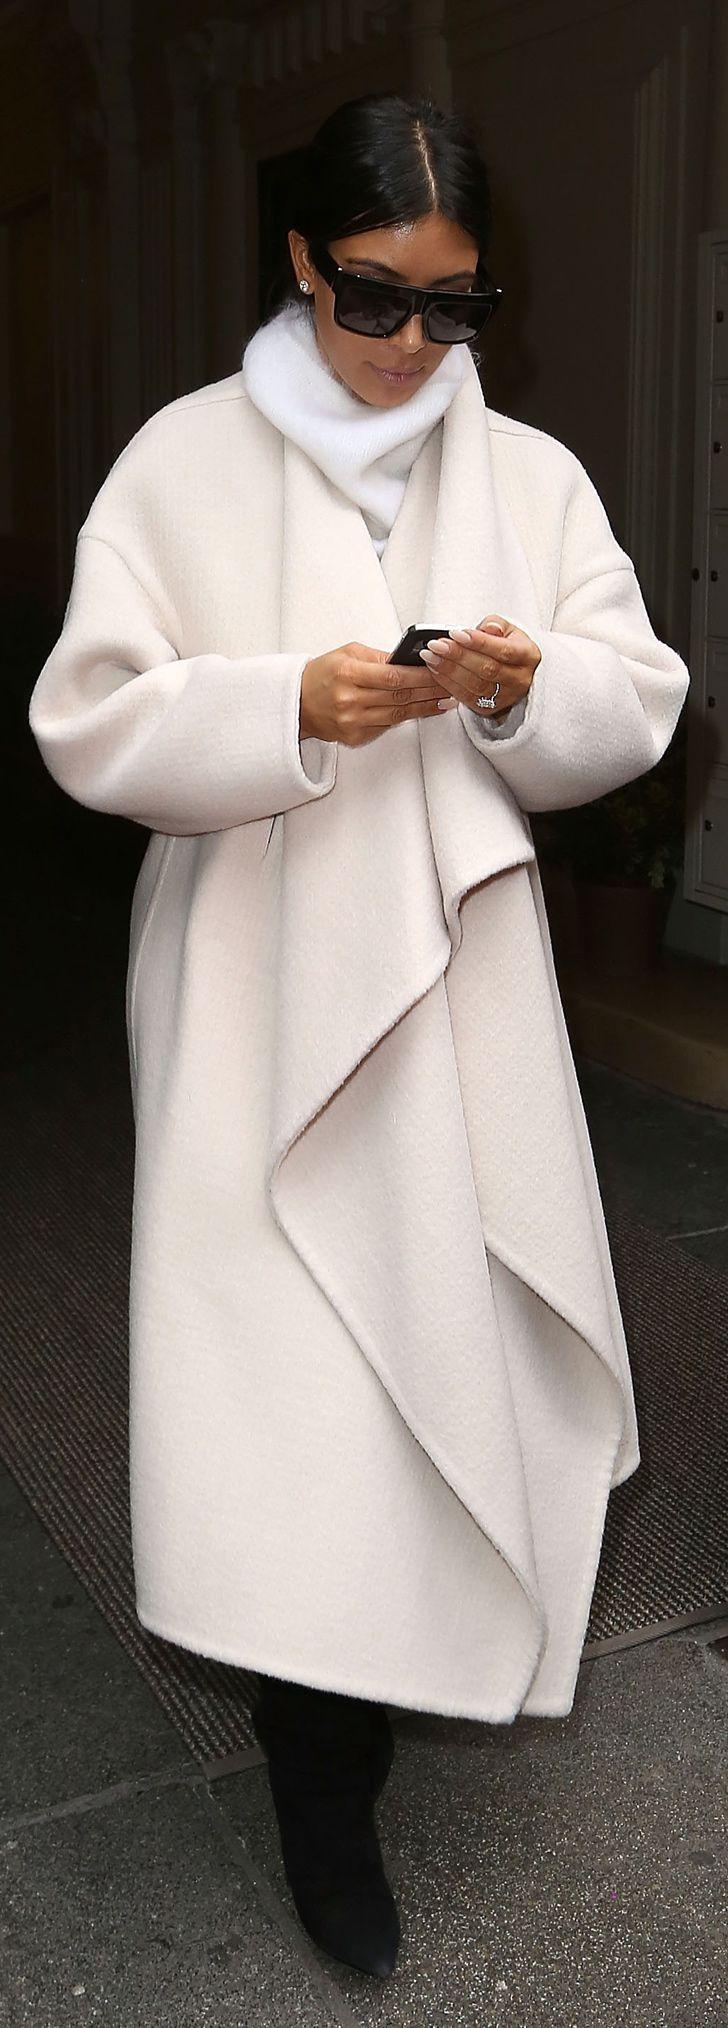 Kim Kardashian's newest coat is a Chloé topper.                                                                                                                                                                                 More